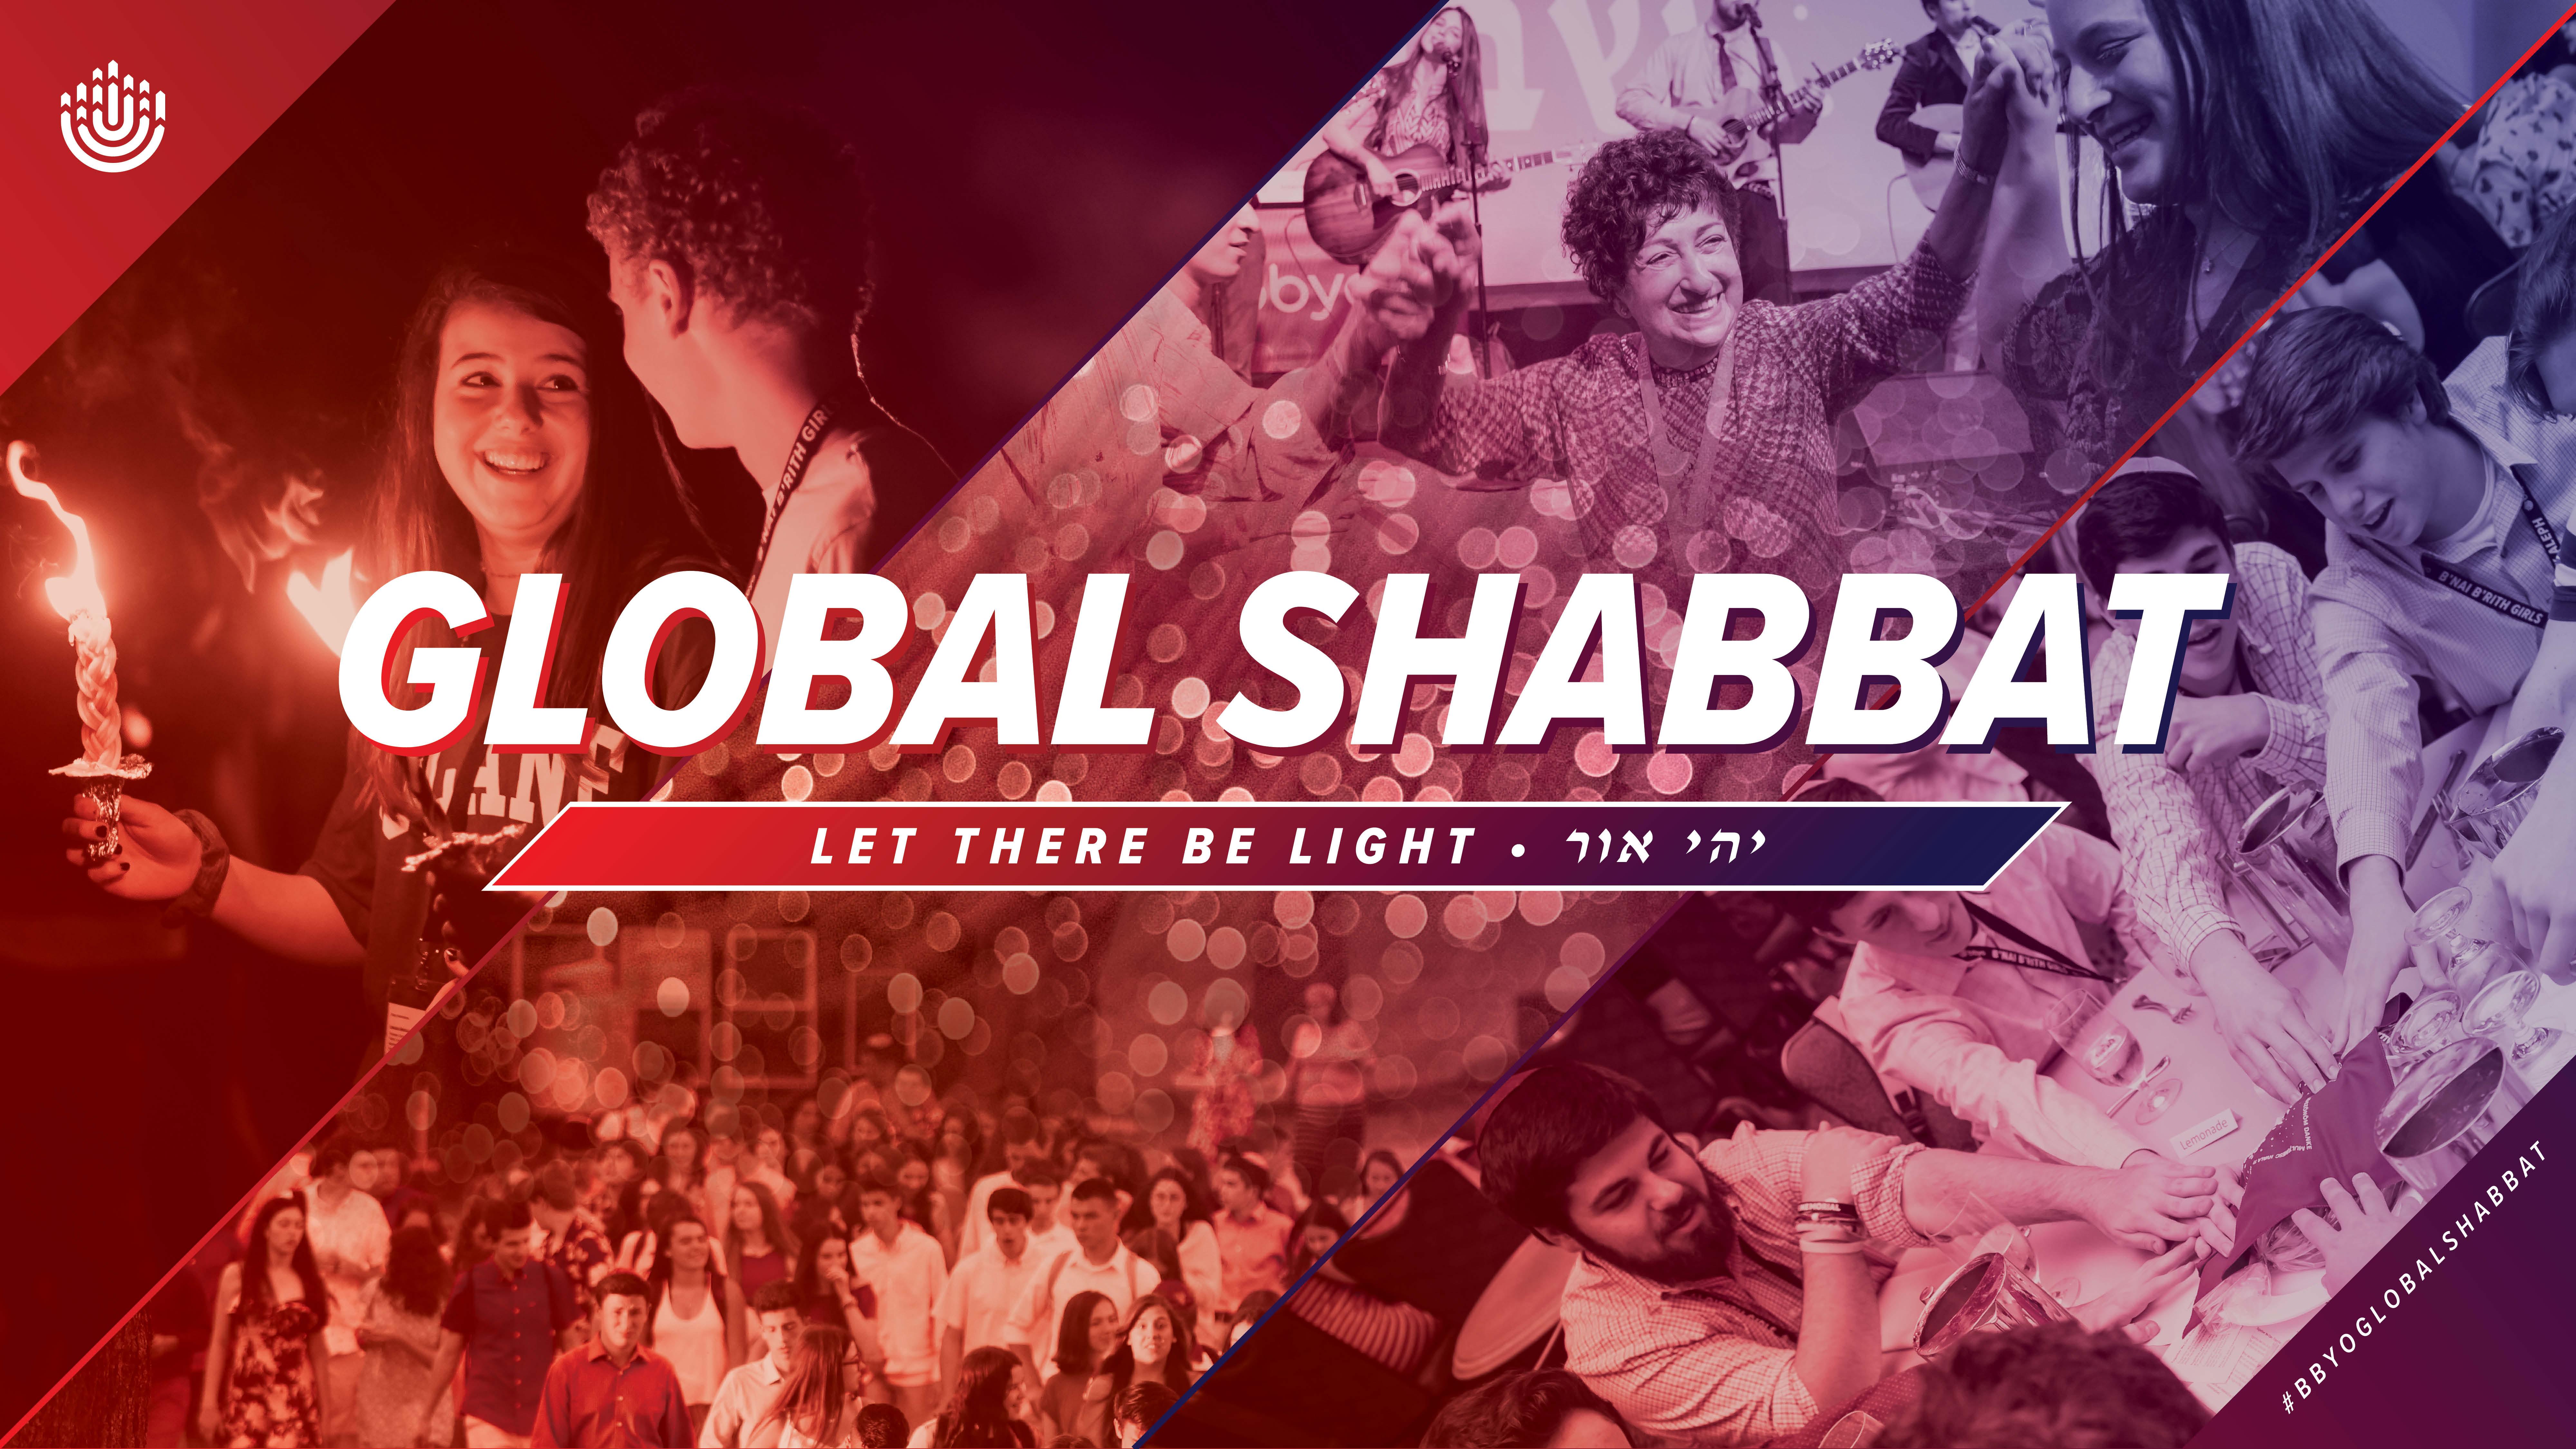 Austin Global Shabbat image